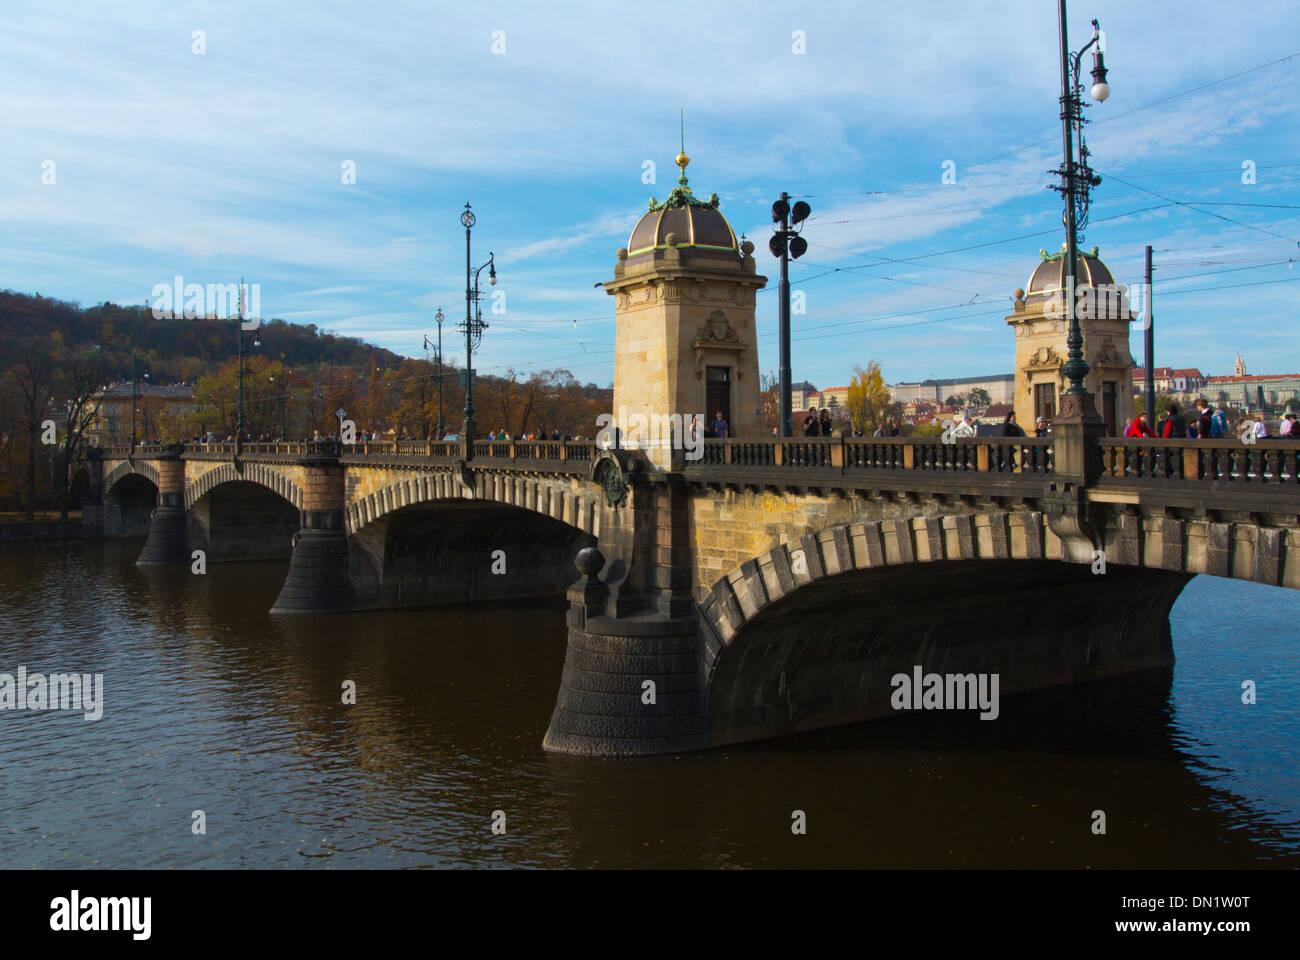 Legii most bridge Prague Czech Republic Europe - Stock Image